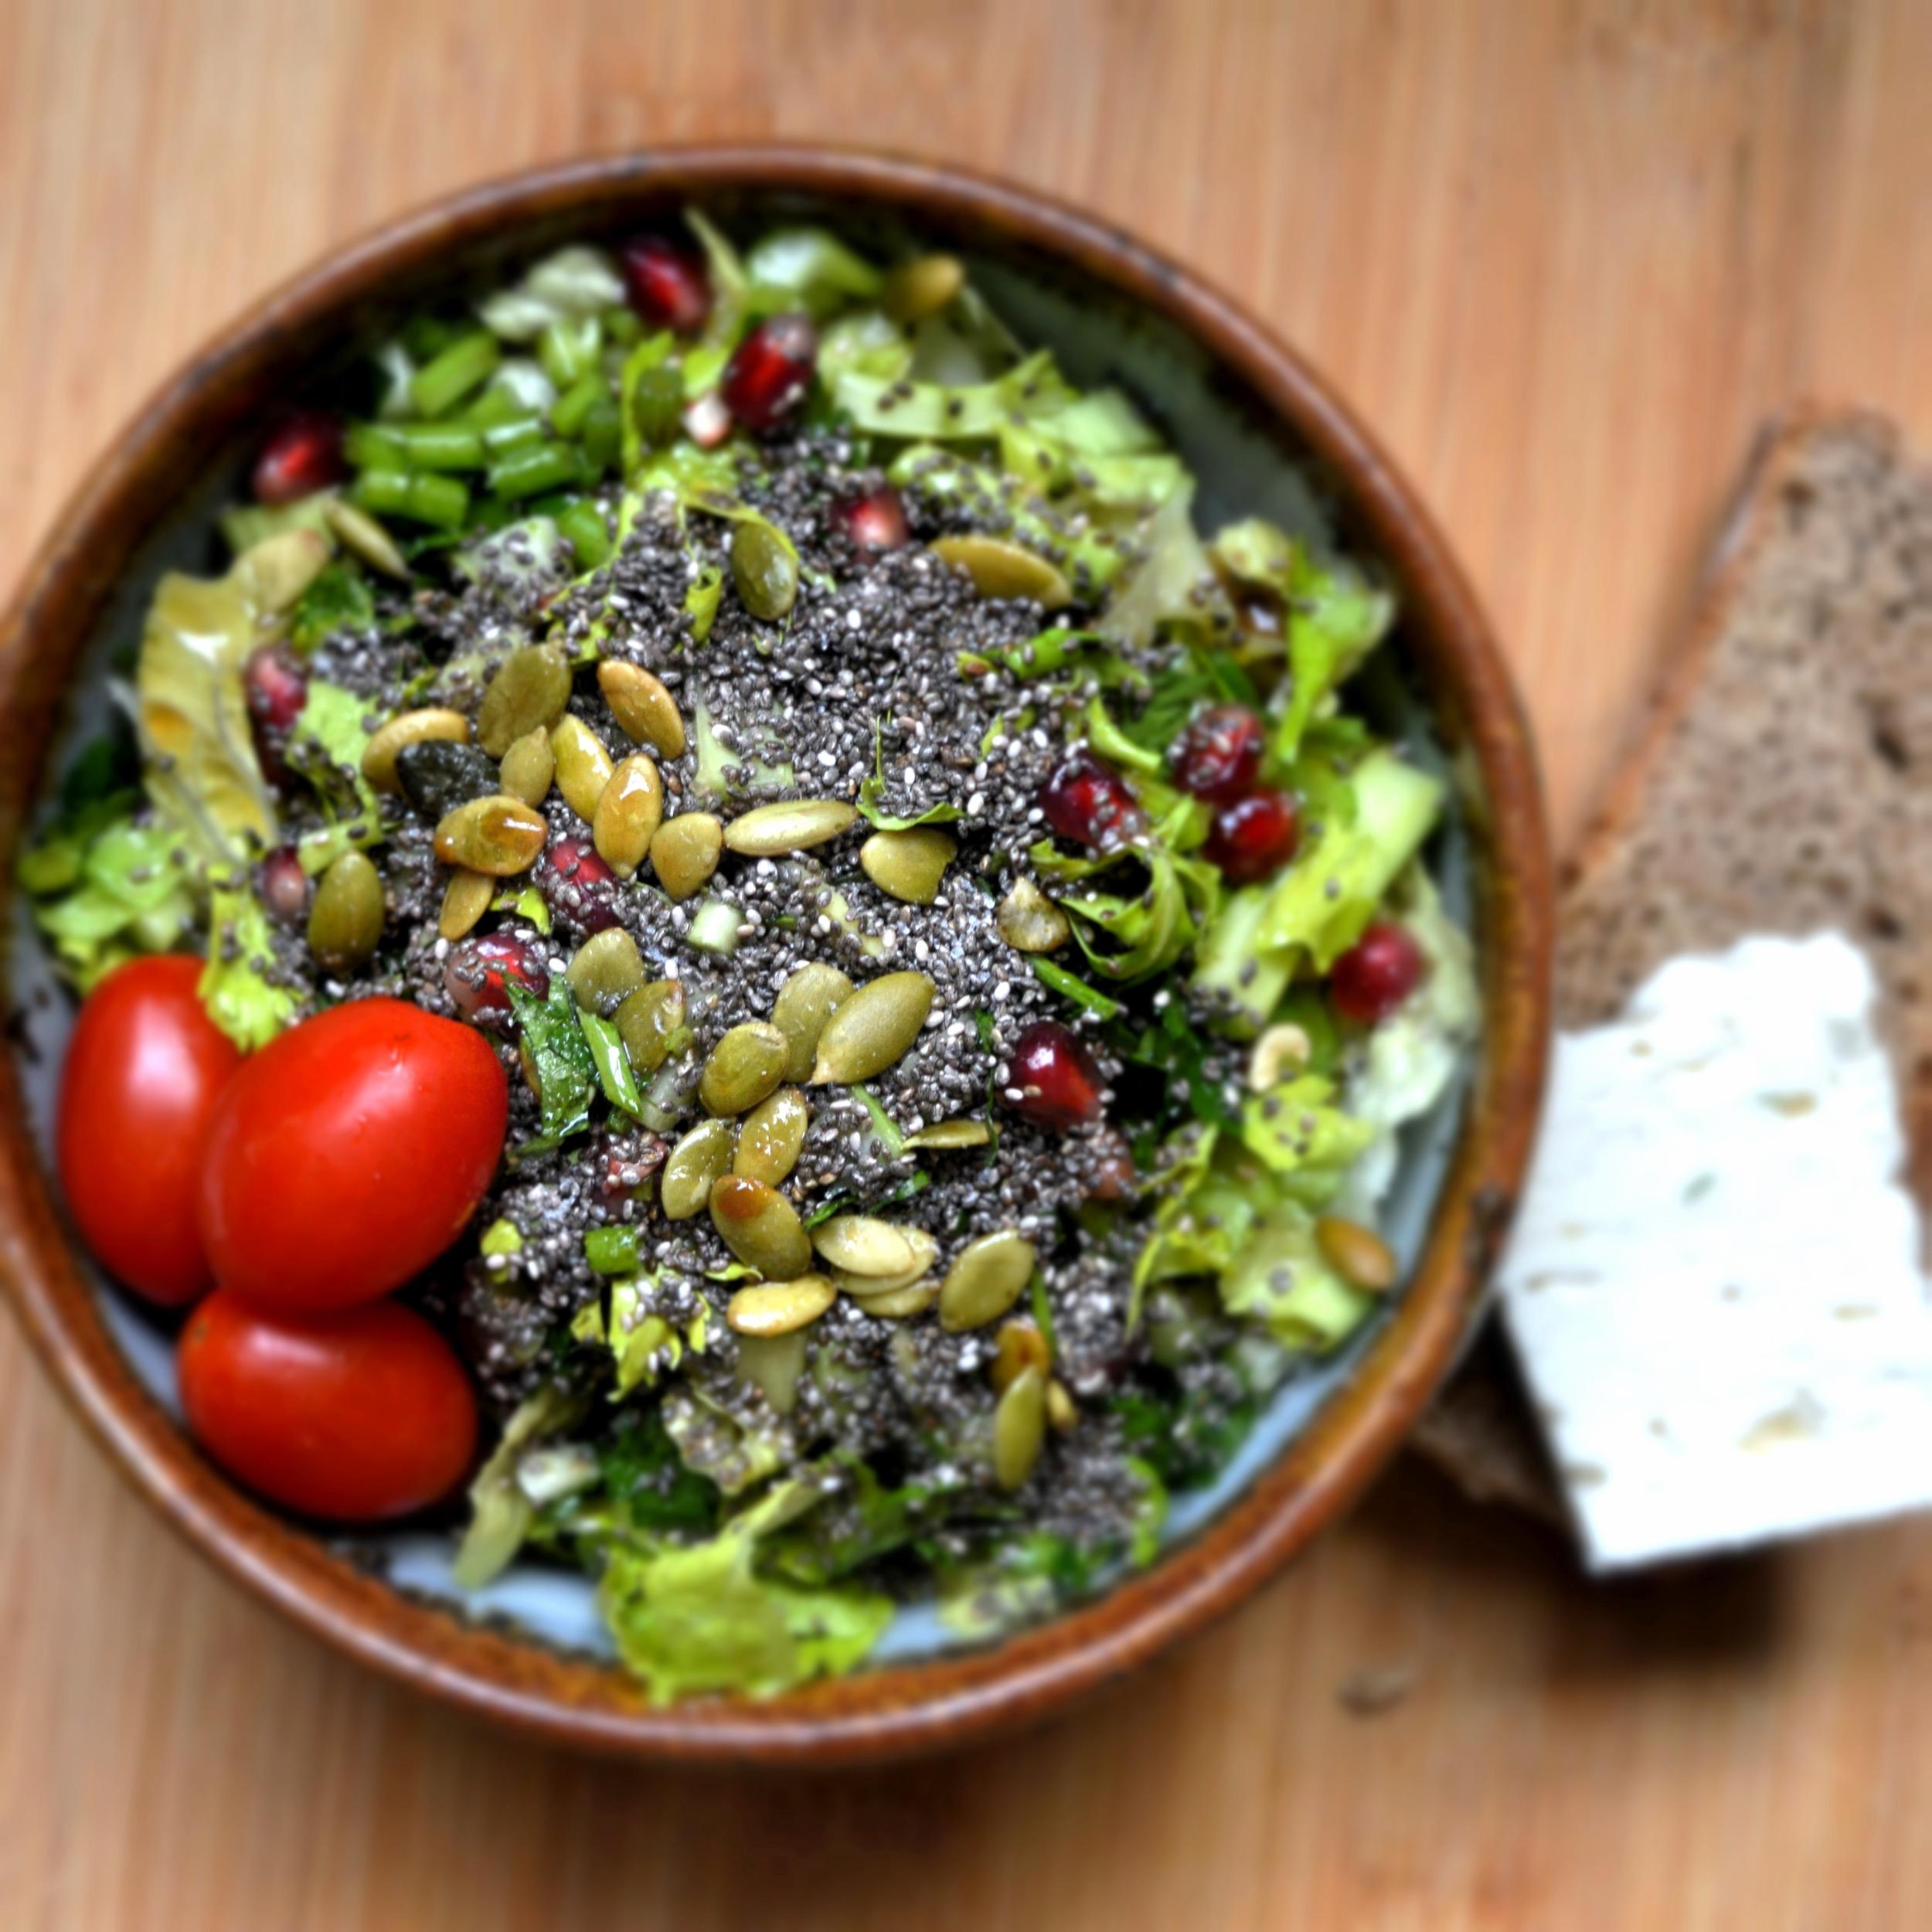 Morning salad